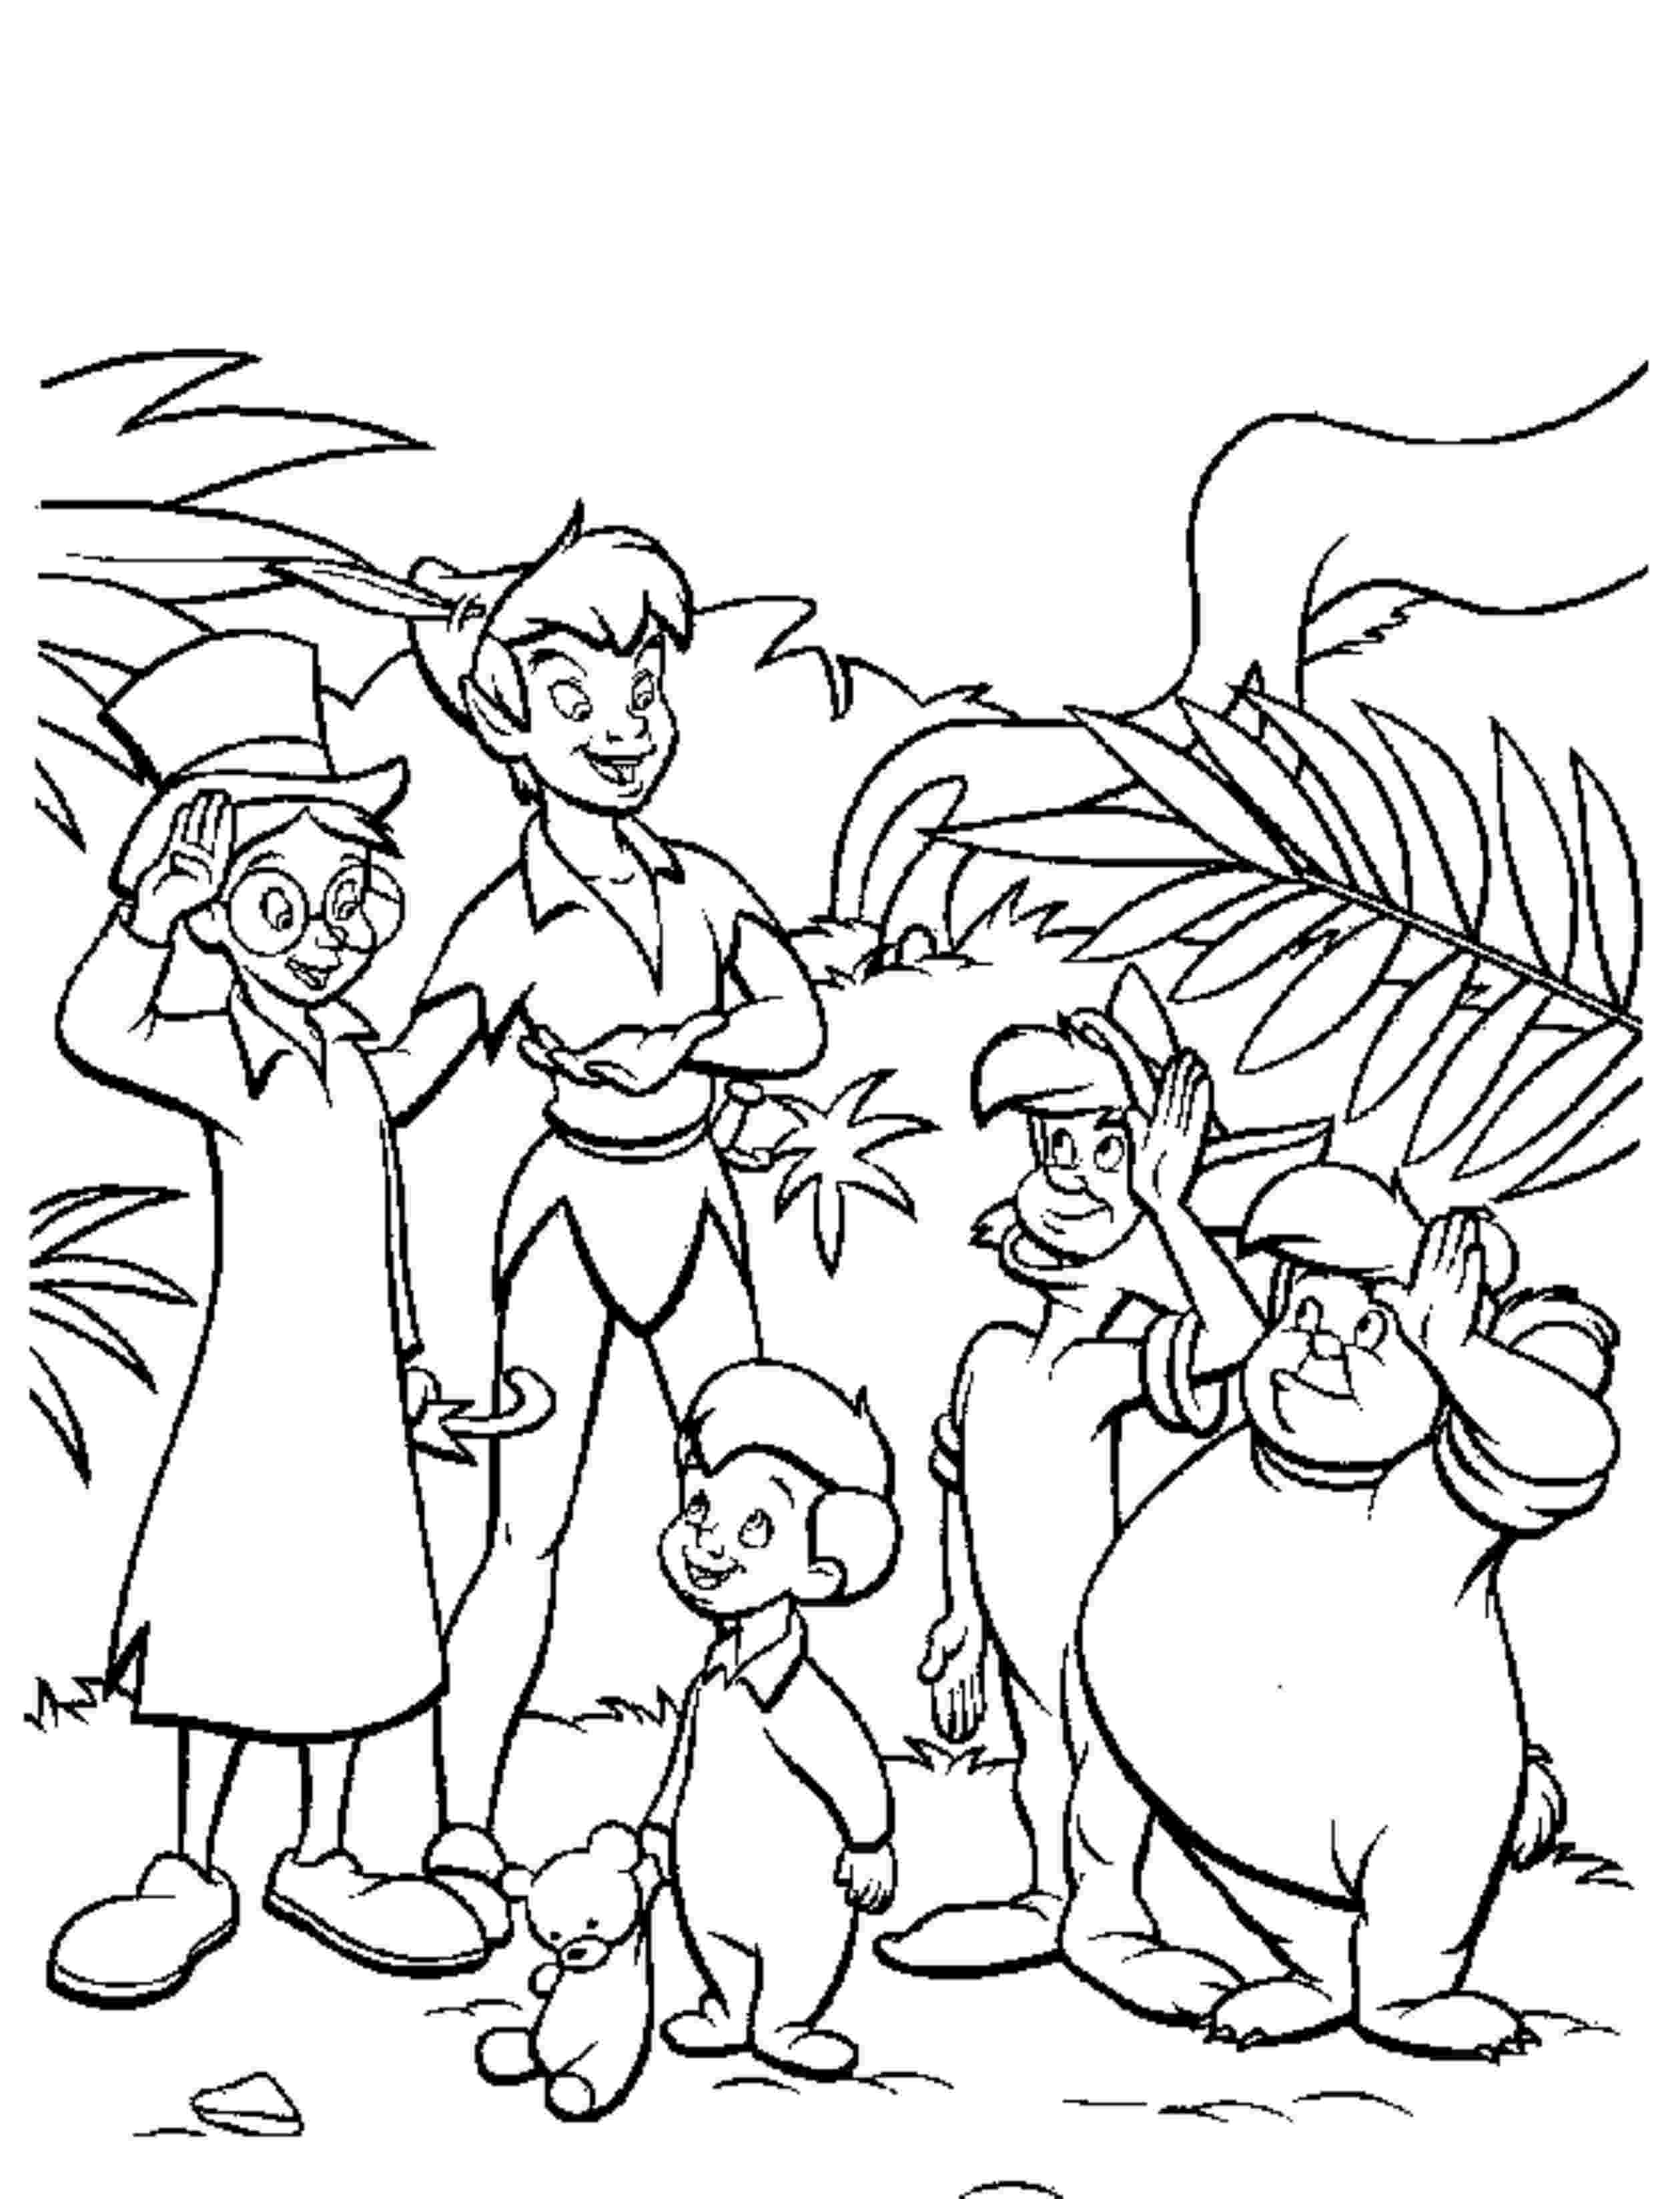 Peter Pan Coloring Pages Printable At Getdrawings